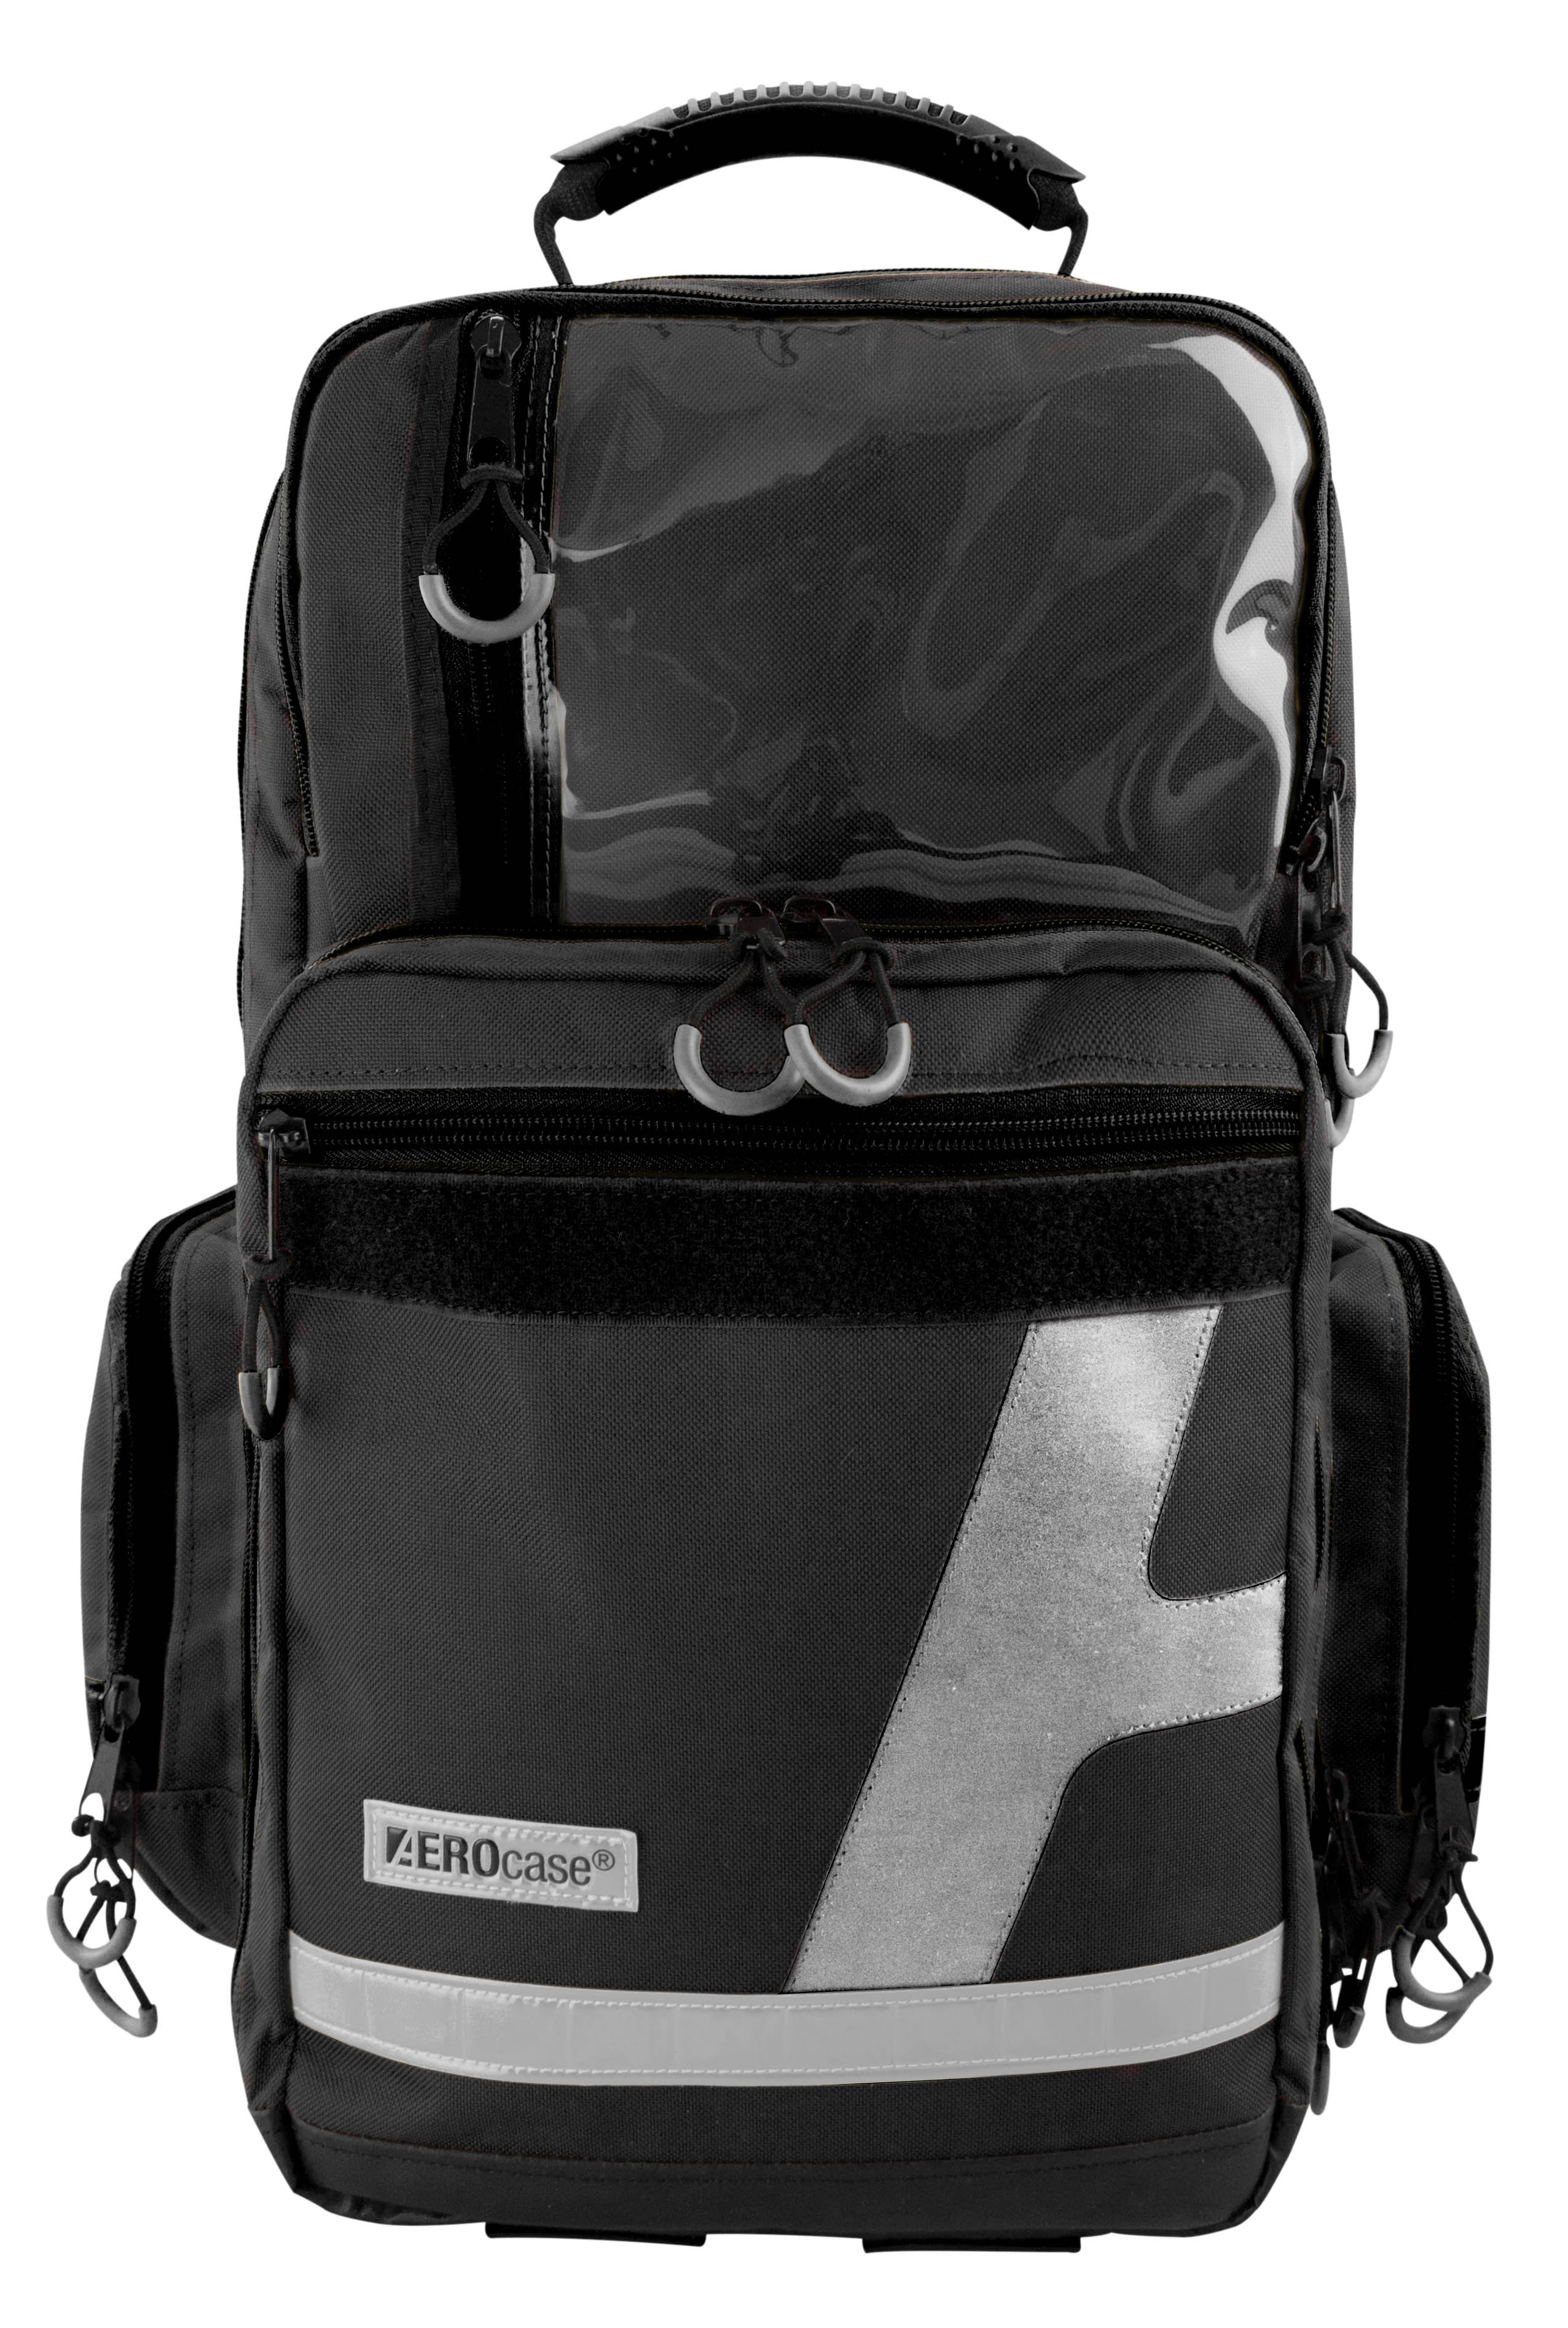 AEROcase Notfallrucksack large Pro1R PL1C Nylon in schwarz